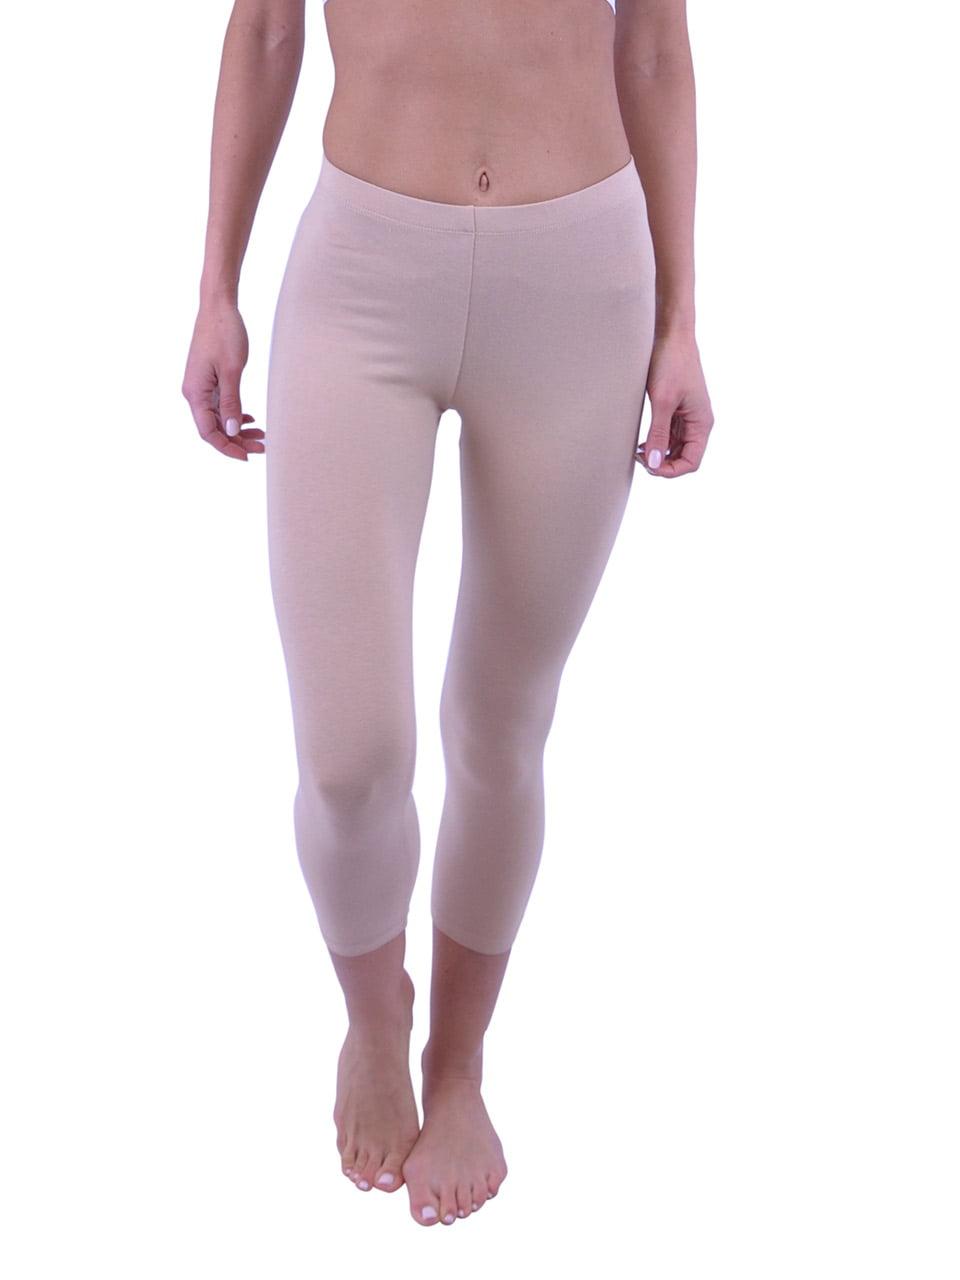 Vivian's Fashions Capri Leggings - Cotton, Junior Size (Beige, 1X)